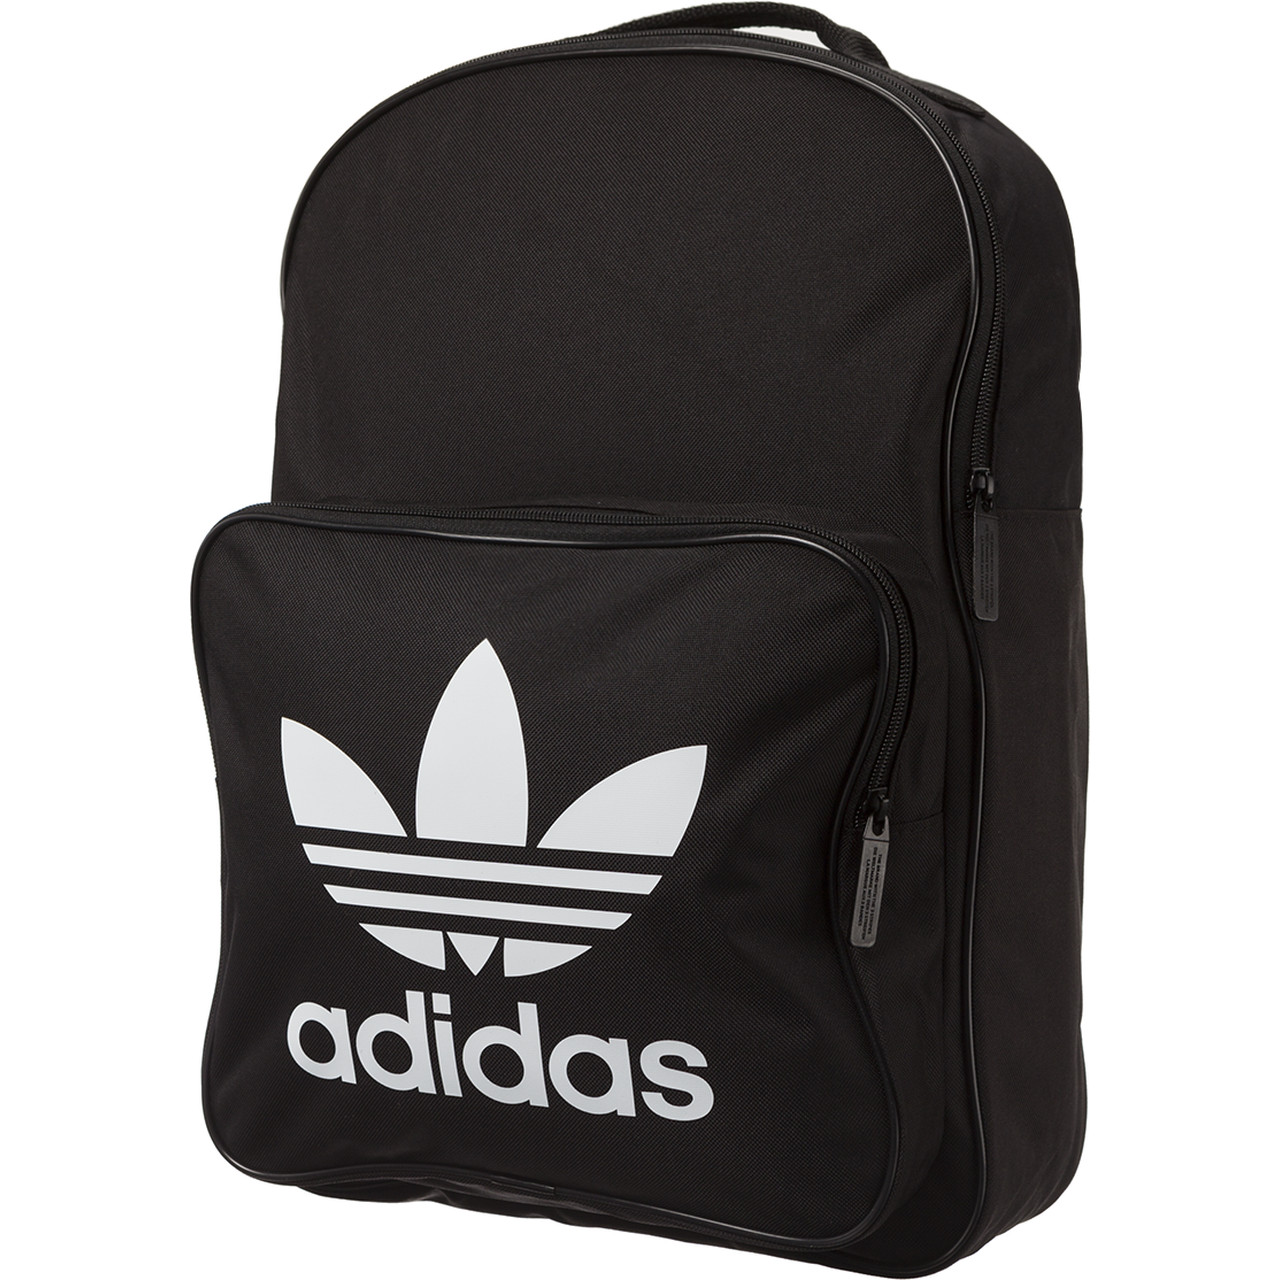 ad6368f9c3393 Plecak adidas BP CLAS TREFOIL 723 - eastend.pl